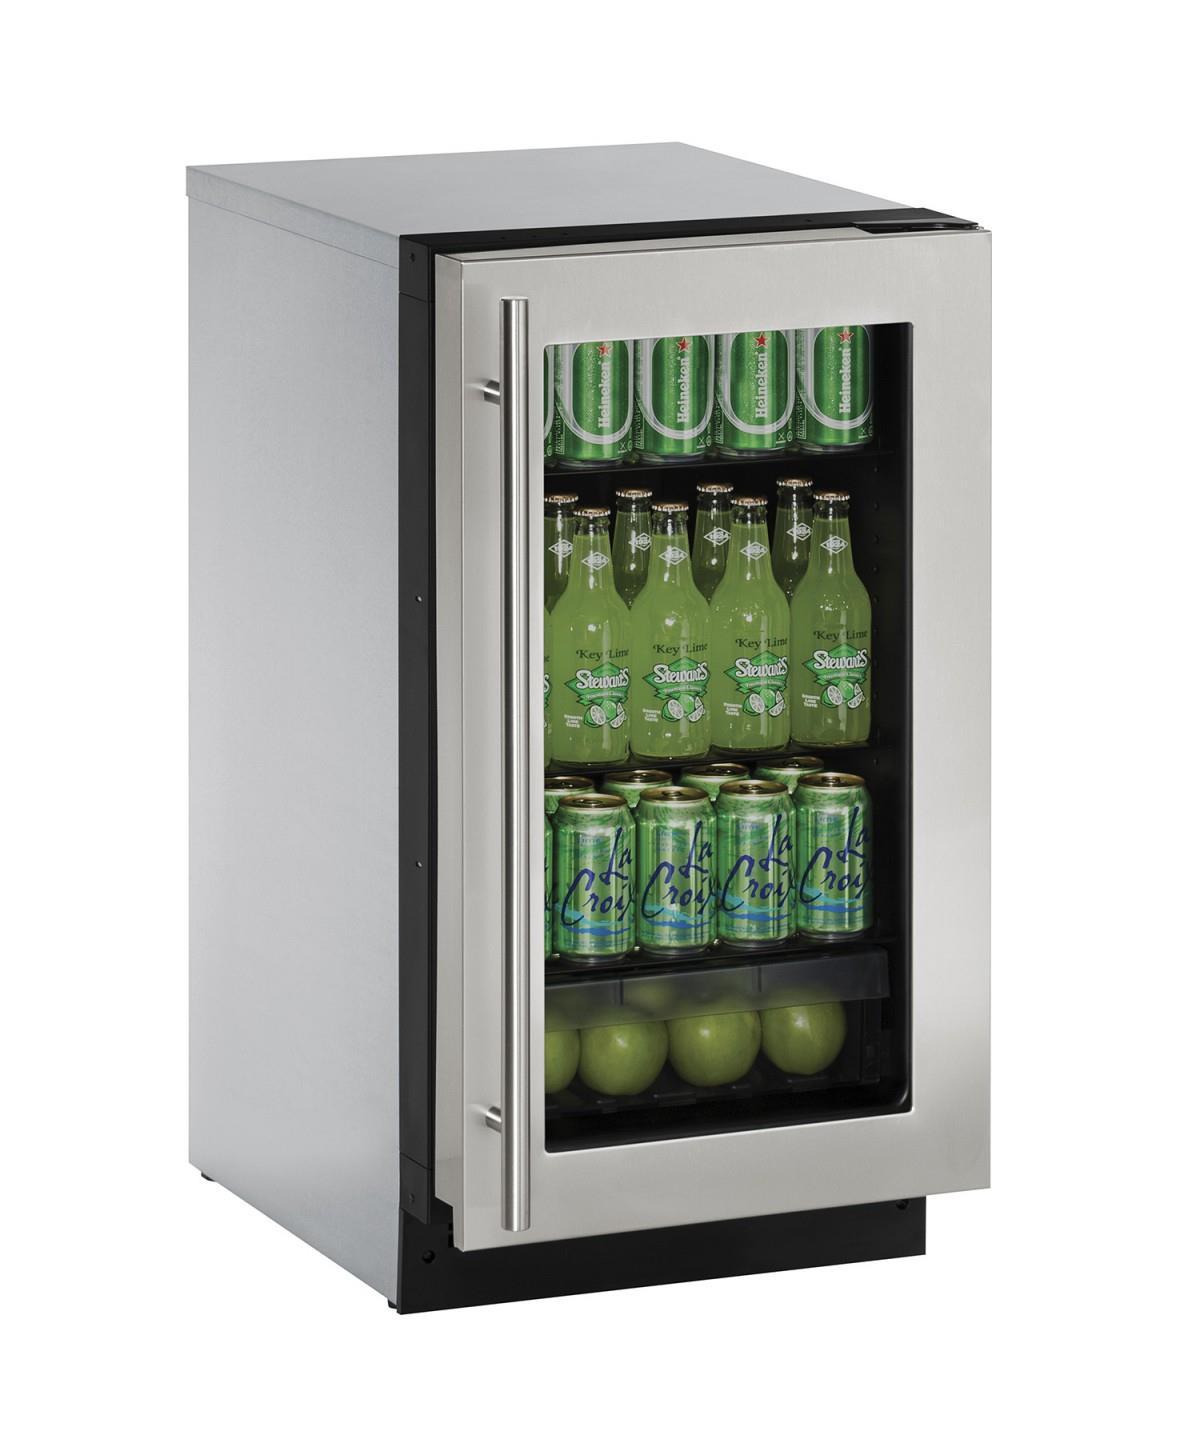 "U-Line Refrigerators 3.6 Cu. Ft. 18"" Compact All-Refrigerator - Item Number: U-2218RGLS-01A"